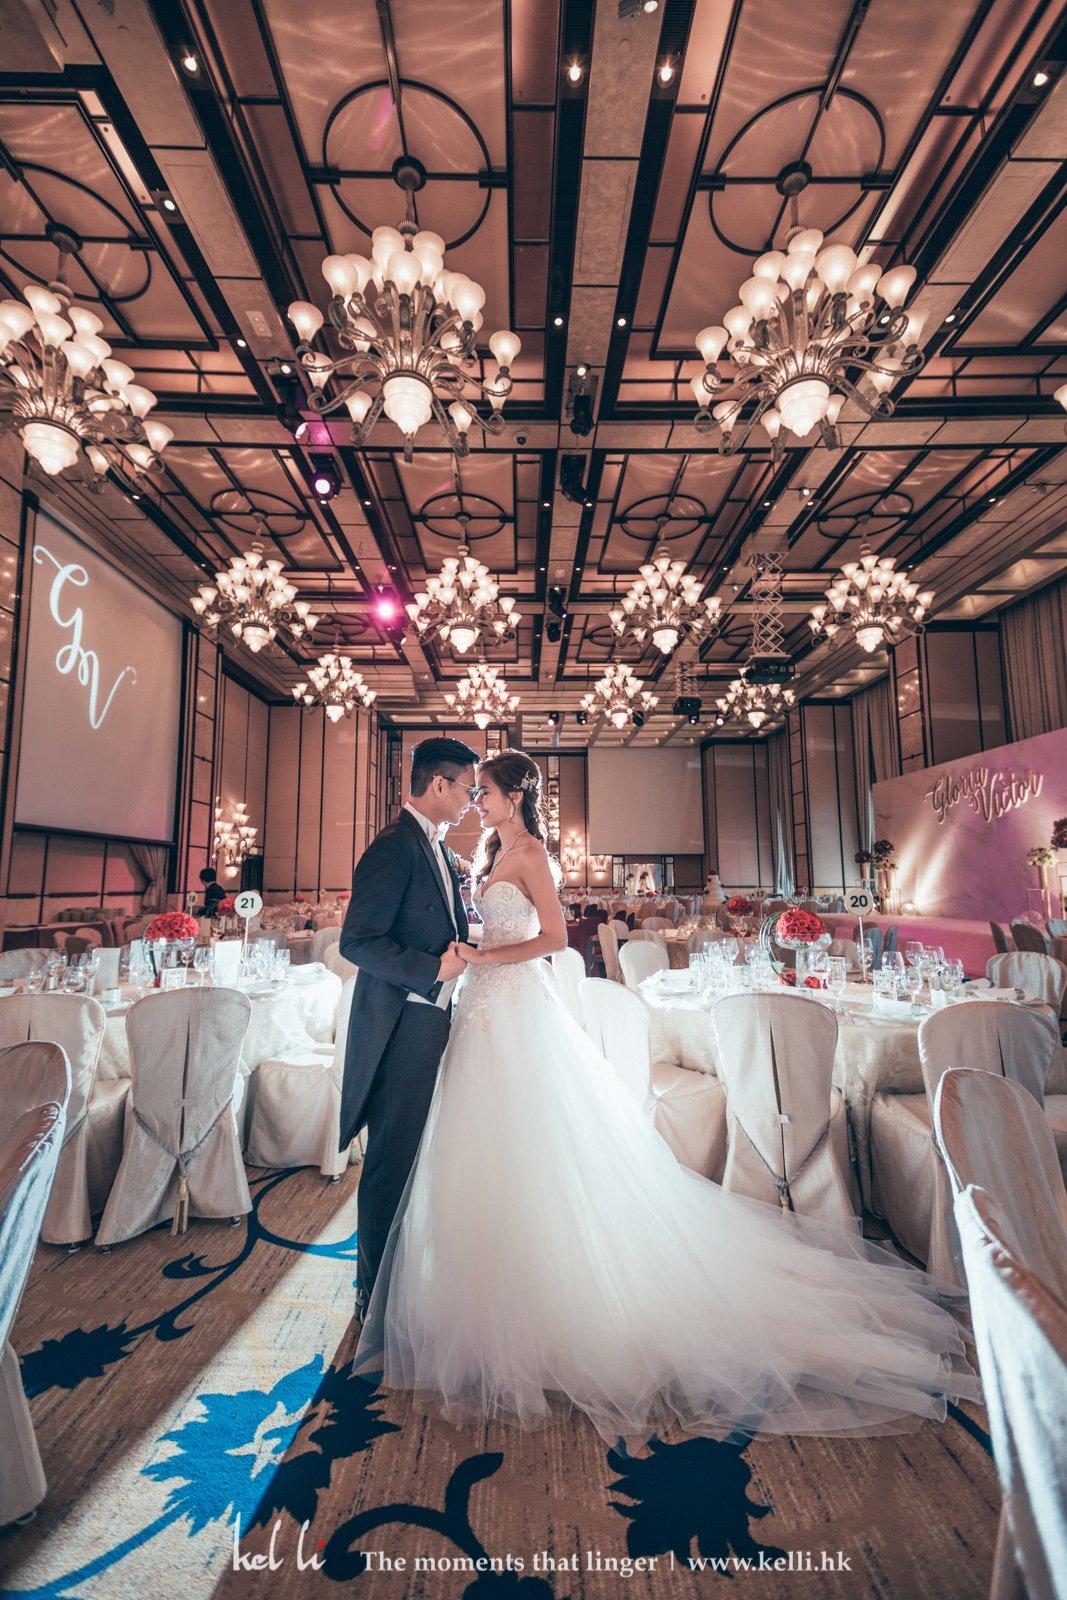 Wedding Banquet showcase 1 | 婚禮晚宴